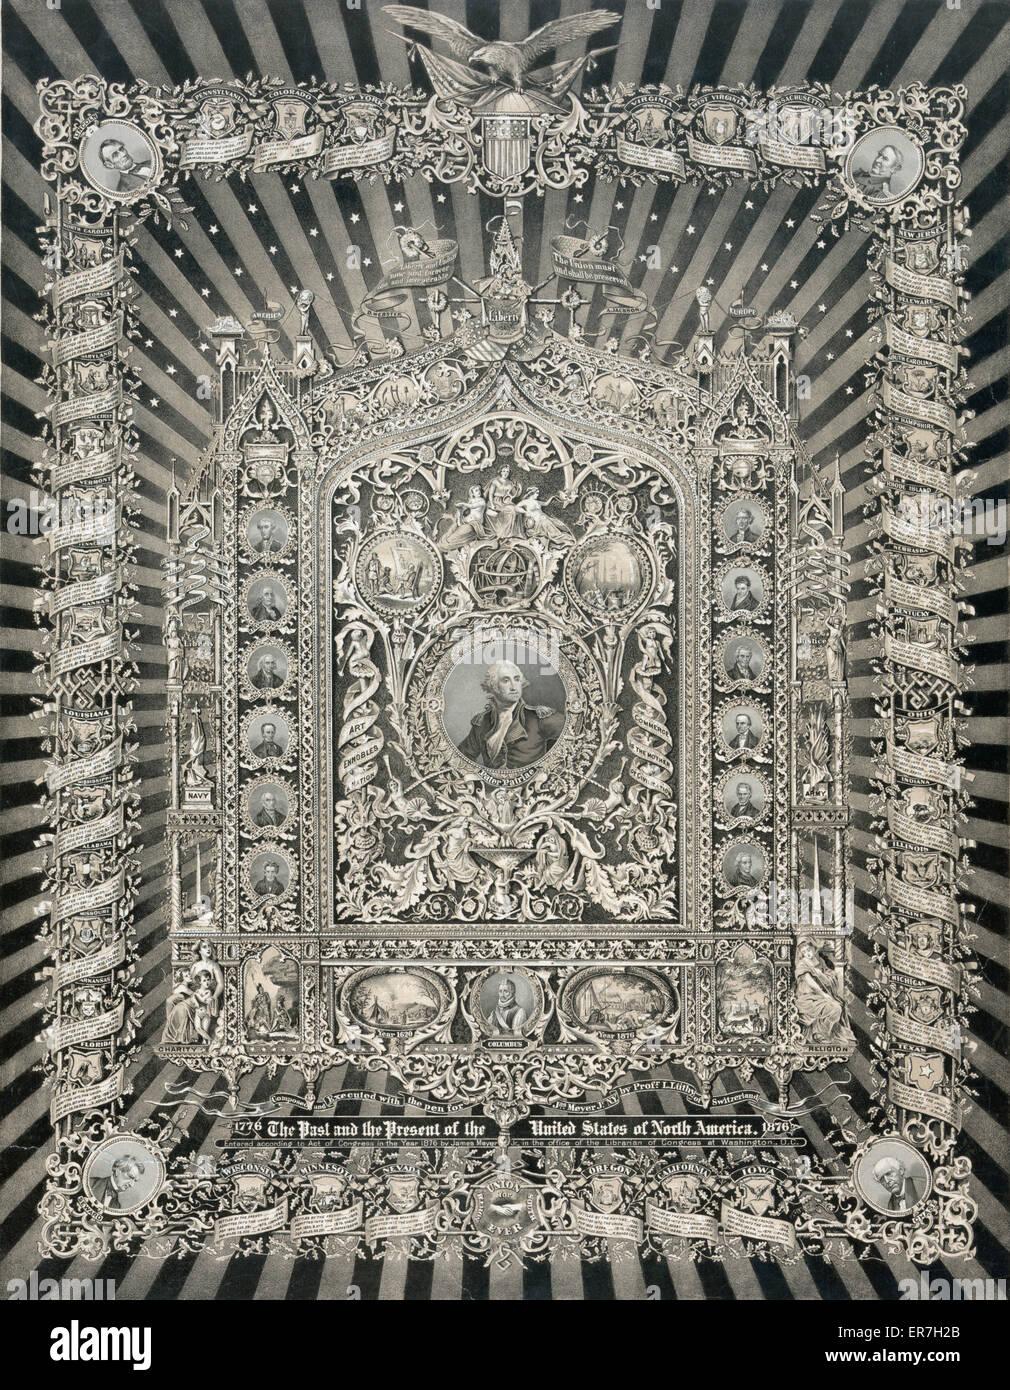 Obra maestra del arte histórico nacional fecha 1876. Imagen De Stock